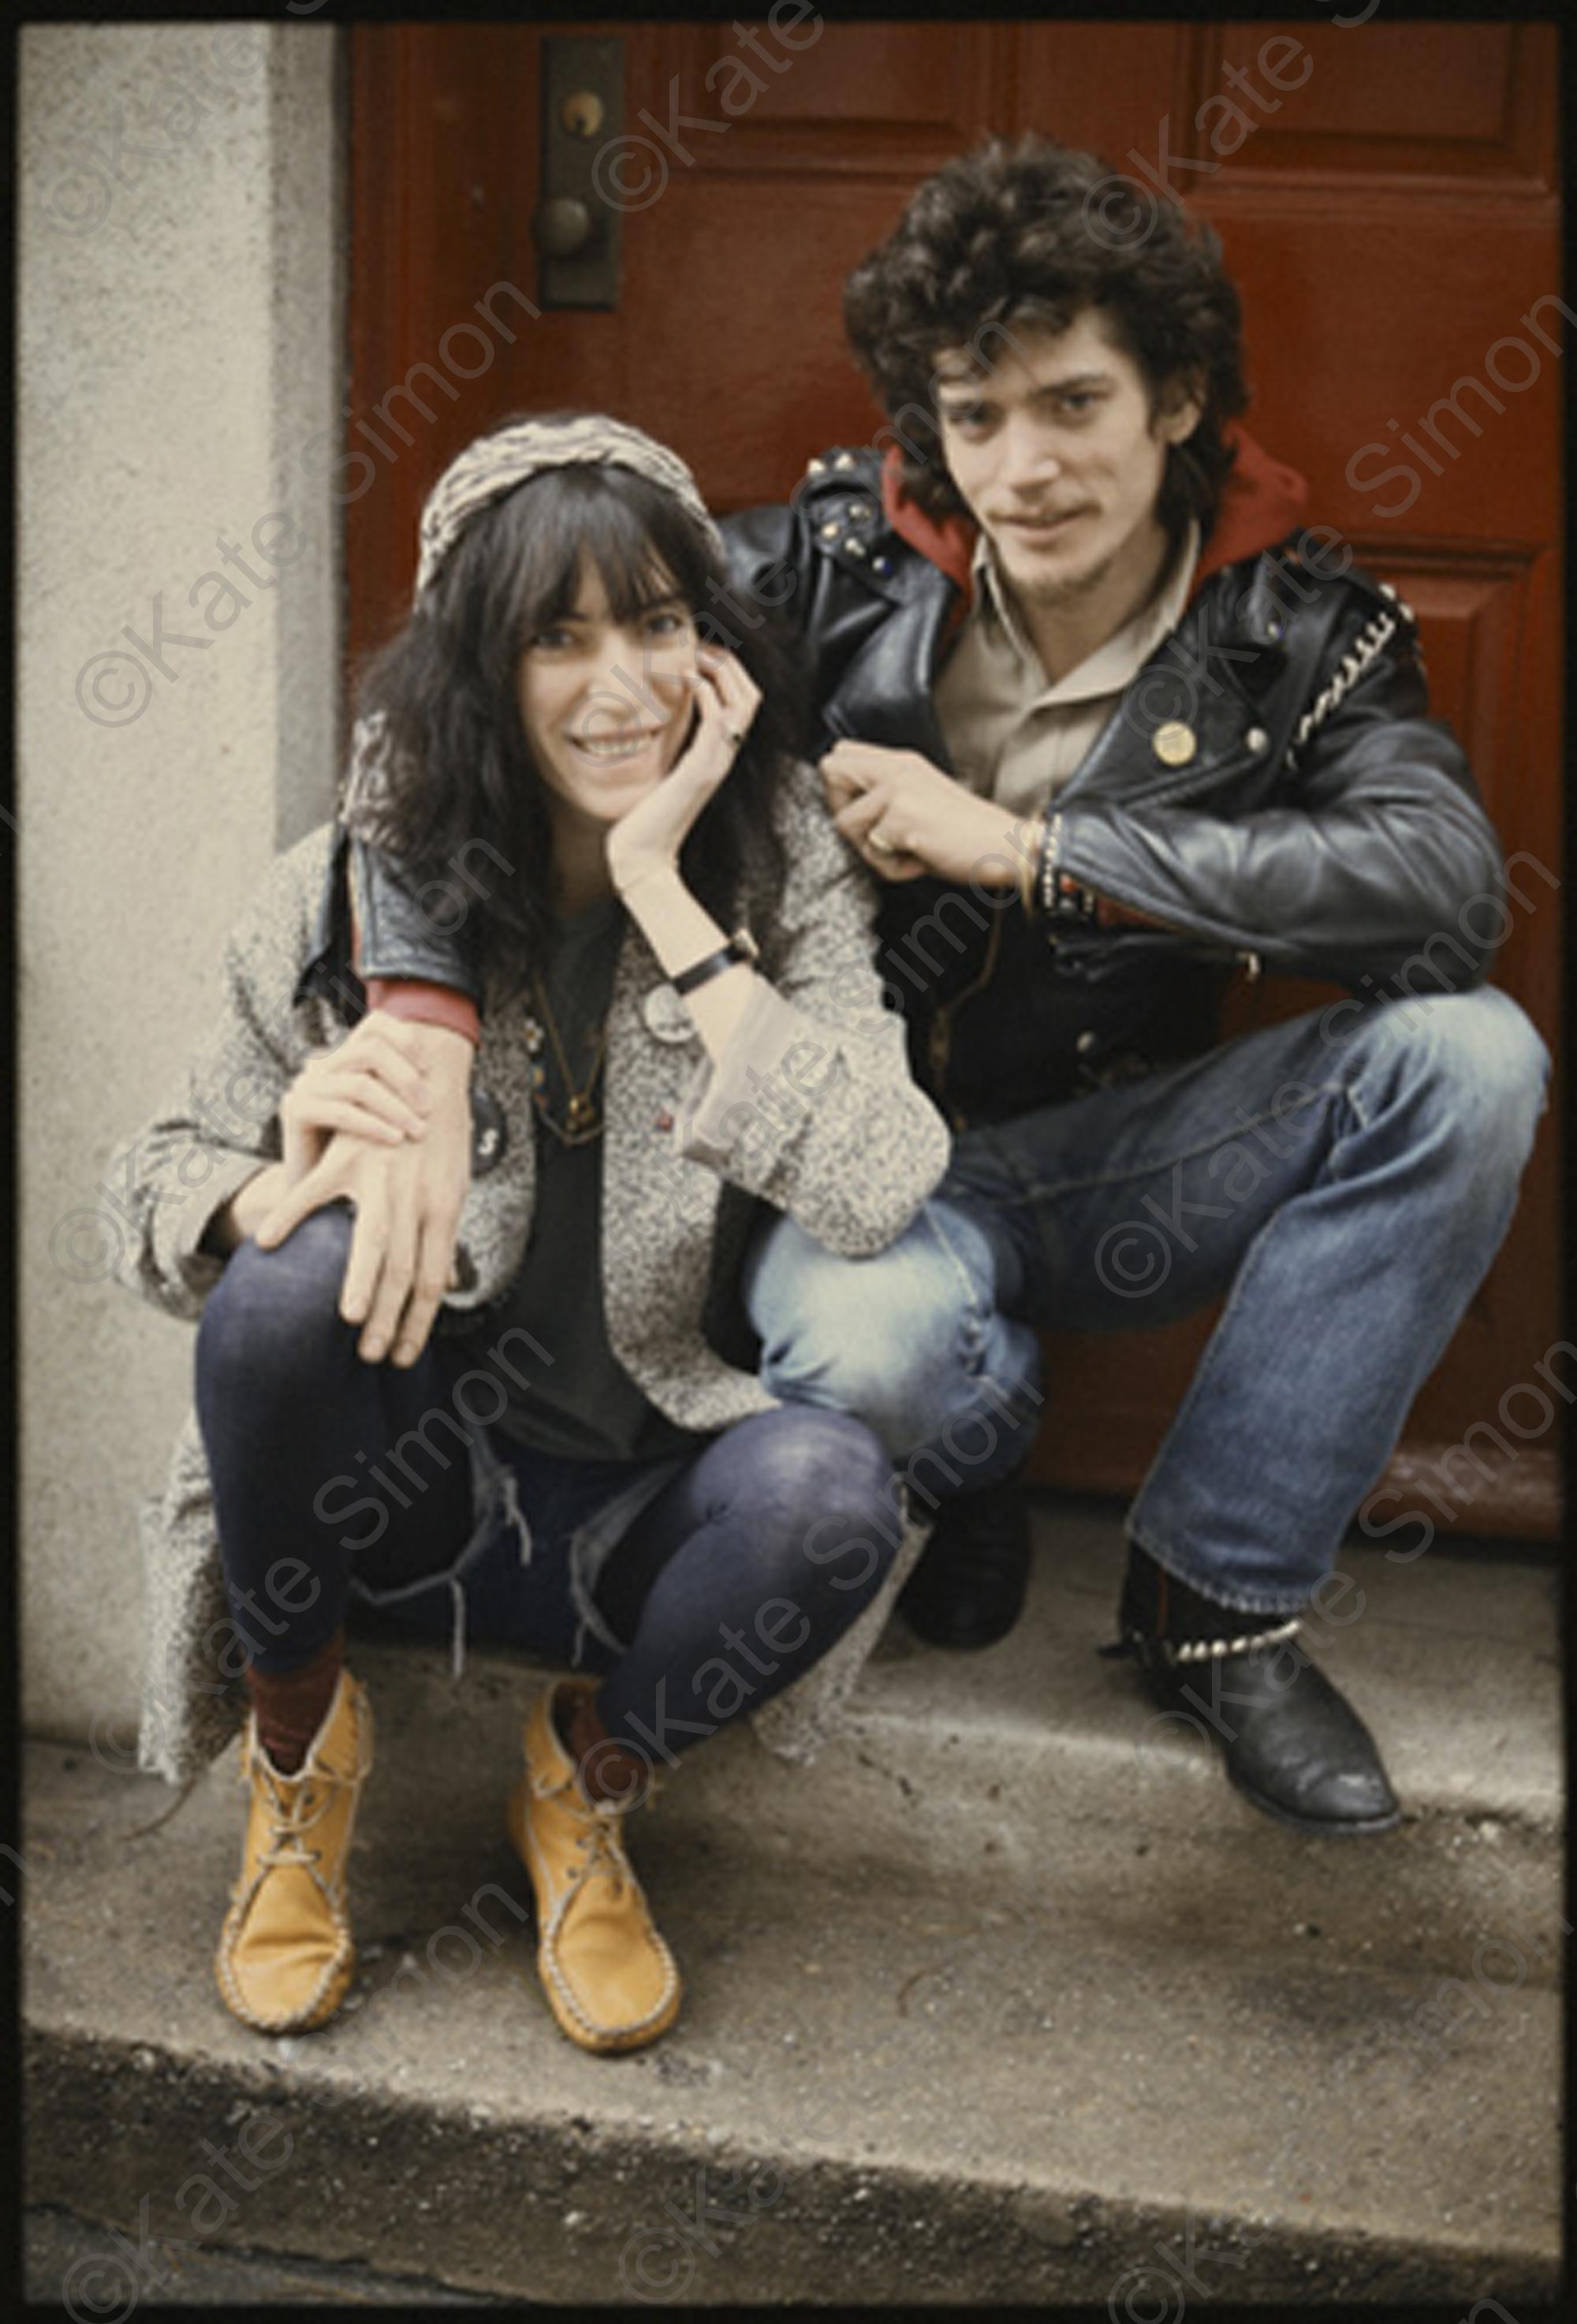 Patti Smith and Robert Mapplethorpe